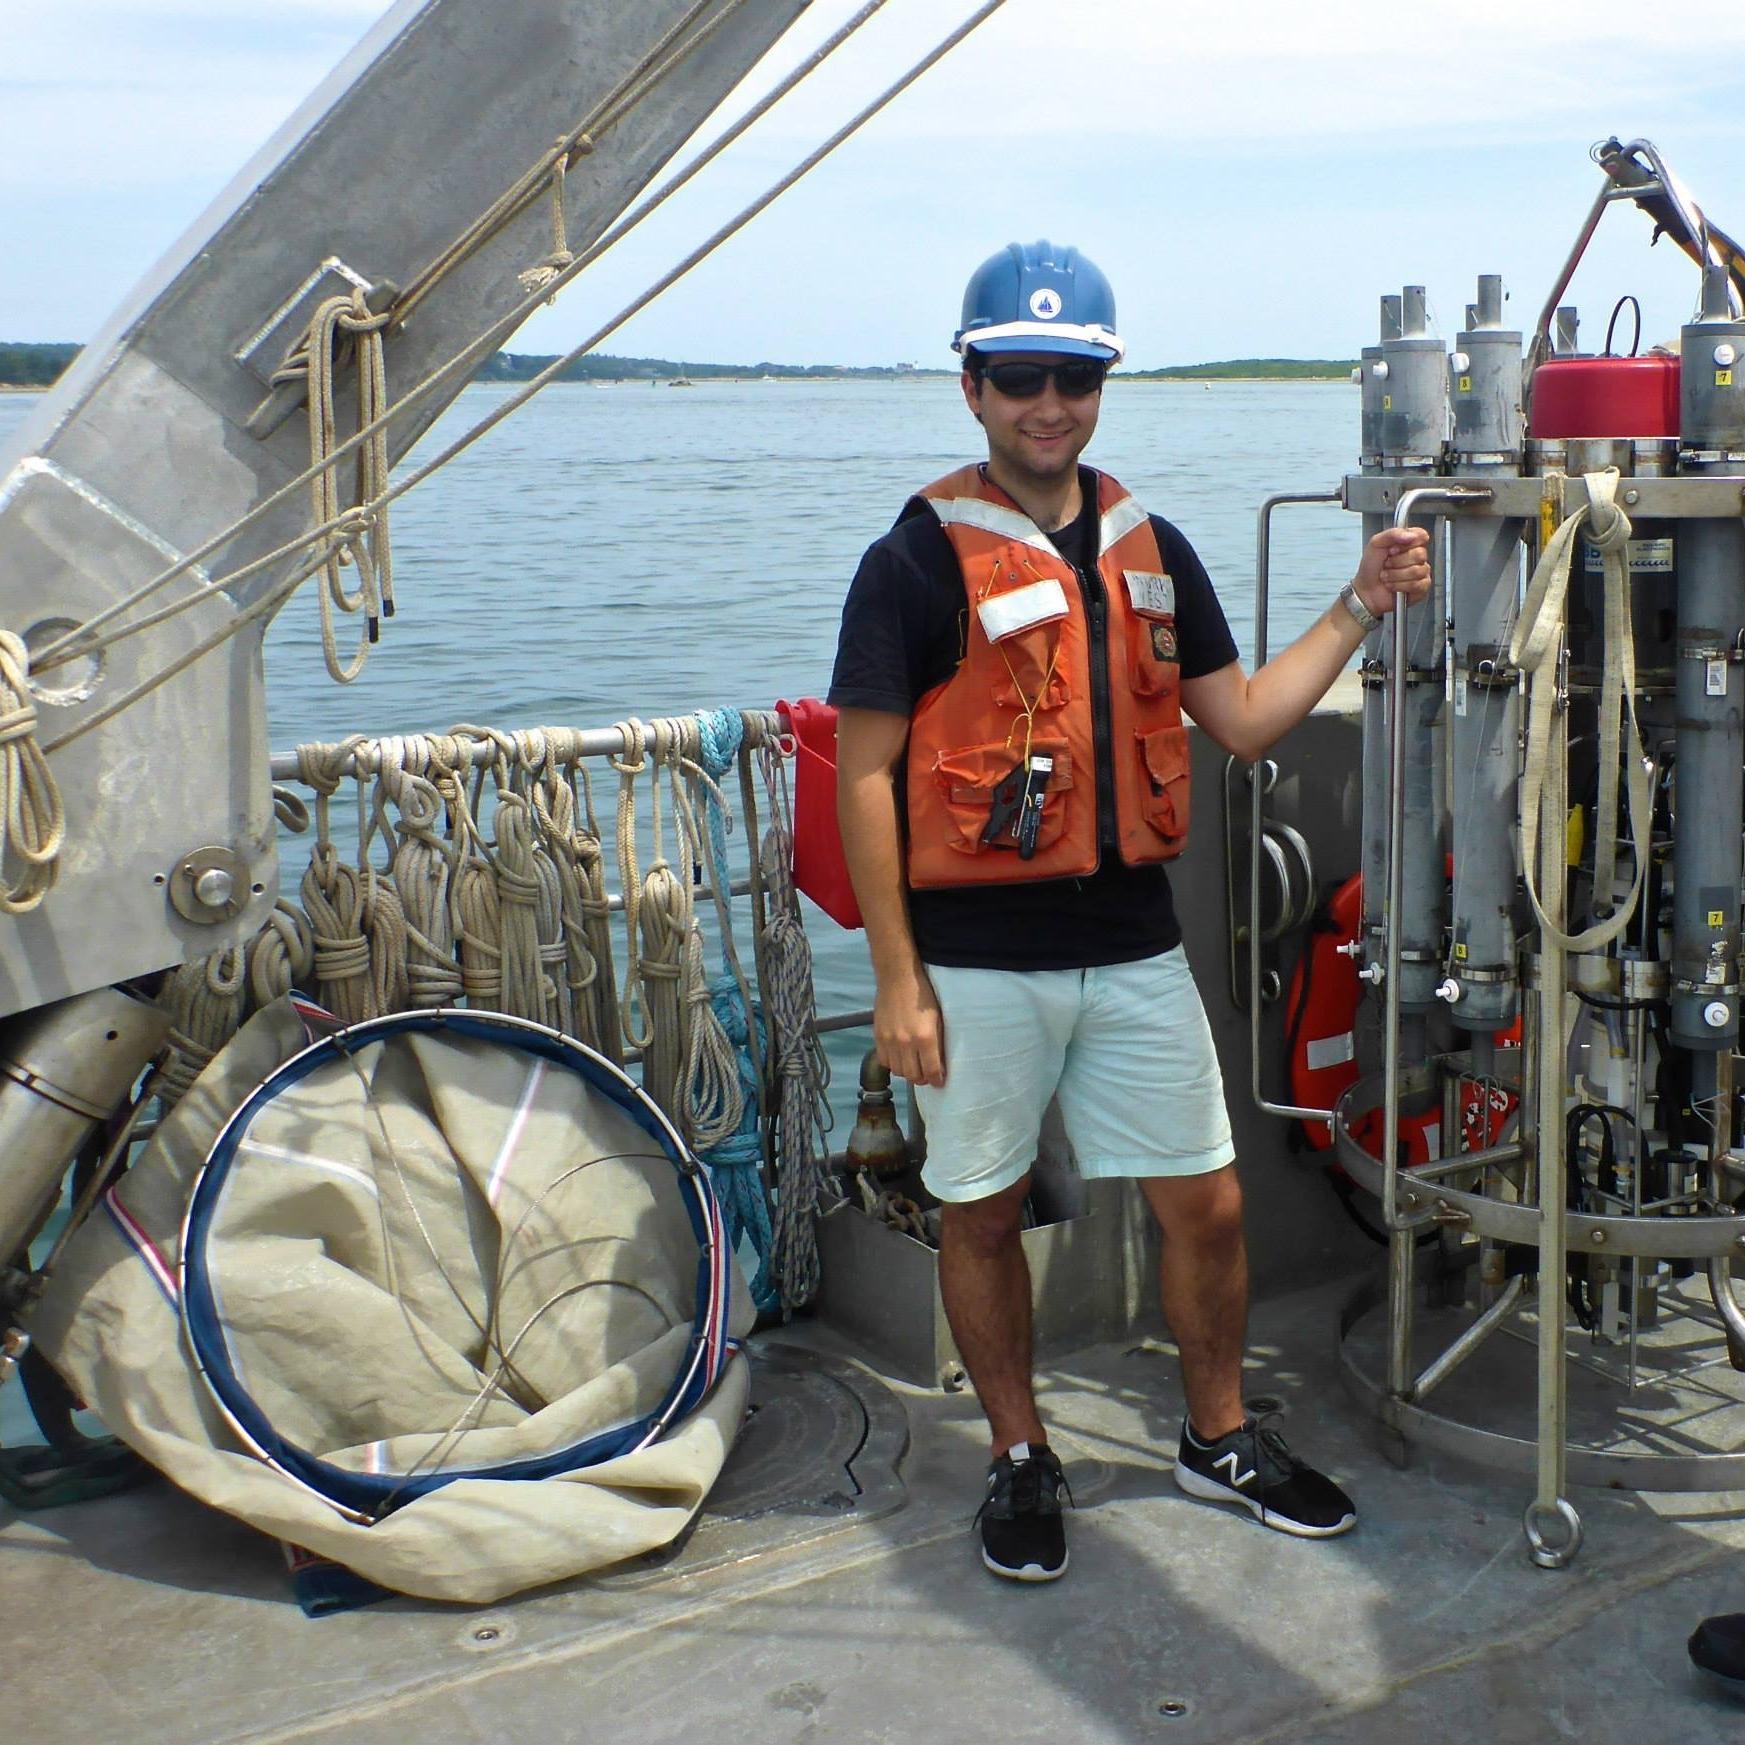 Day cruise on the R/V Tioga. Photo Credit: Ann Dunham